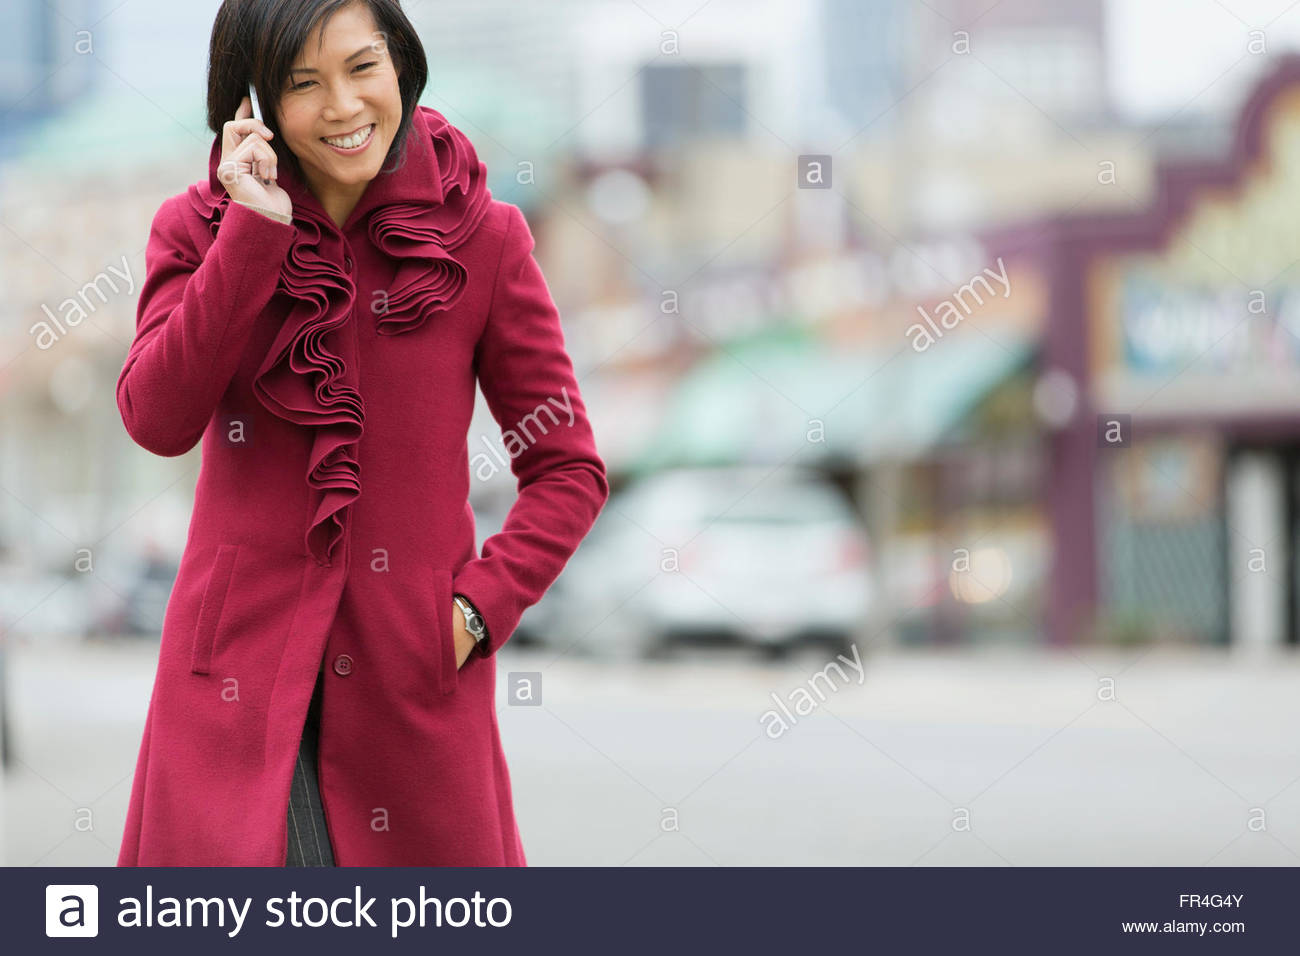 Asian woman walking on city sidewalk while talking on phone. - Stock Image